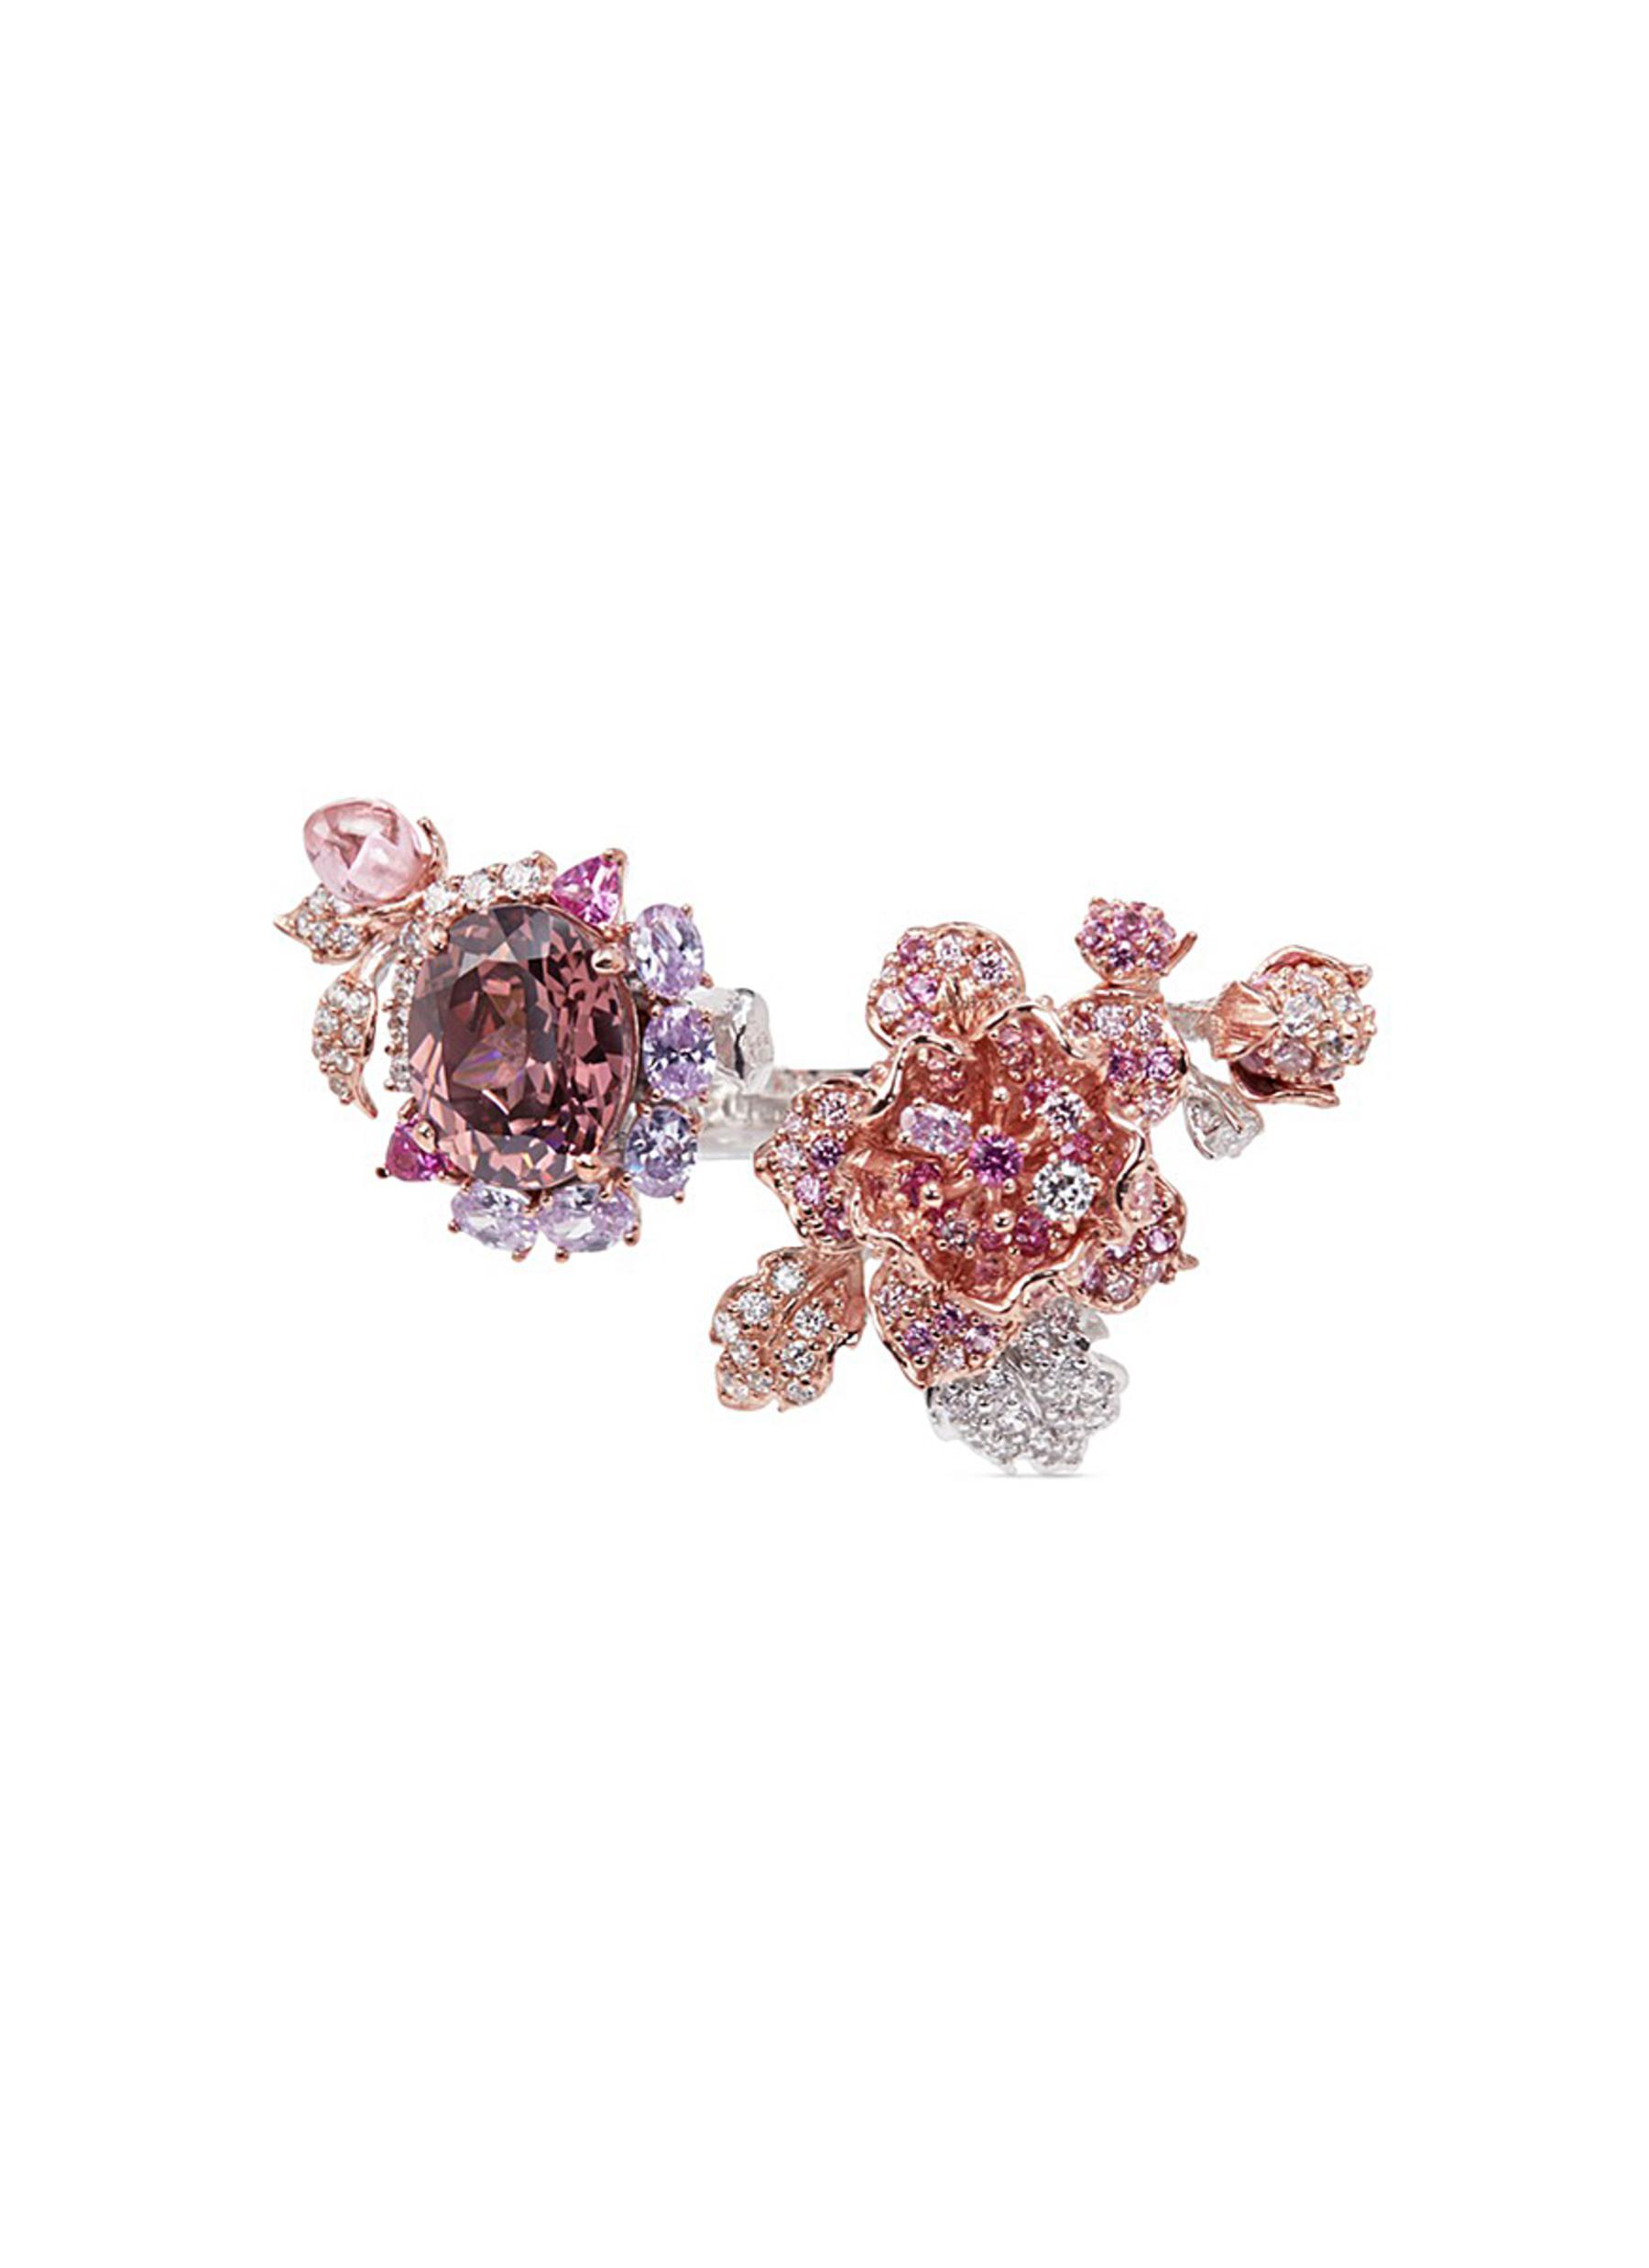 anabela chan female delphinium diamond gemstone 18k gold floral open ring